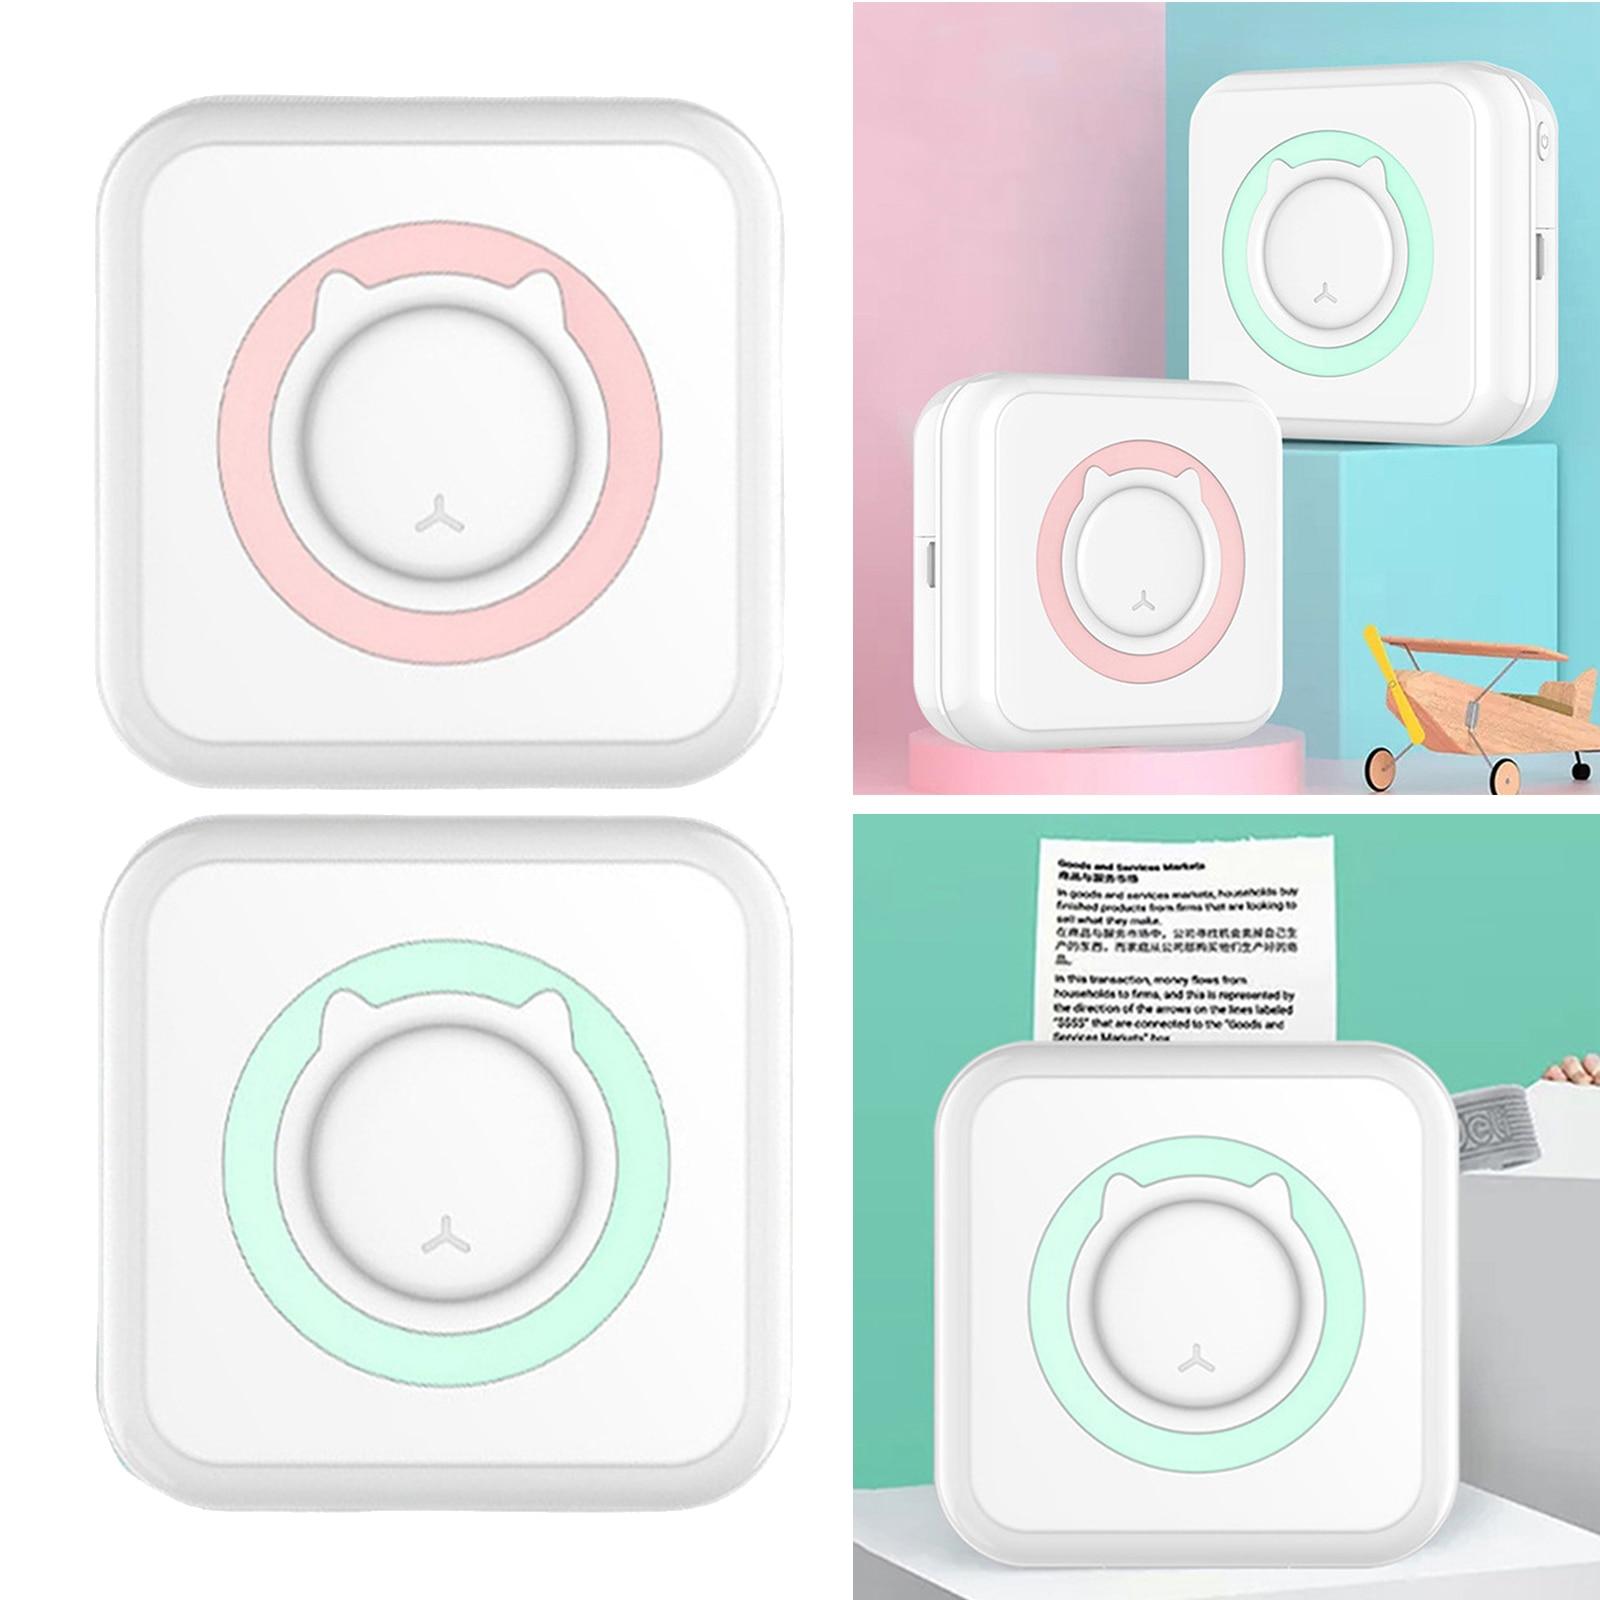 Wireless Label Printer Bluetooth Mini Portable Pocket Thermal Photo Tag Price Sticker Printer Printing Home Office Use